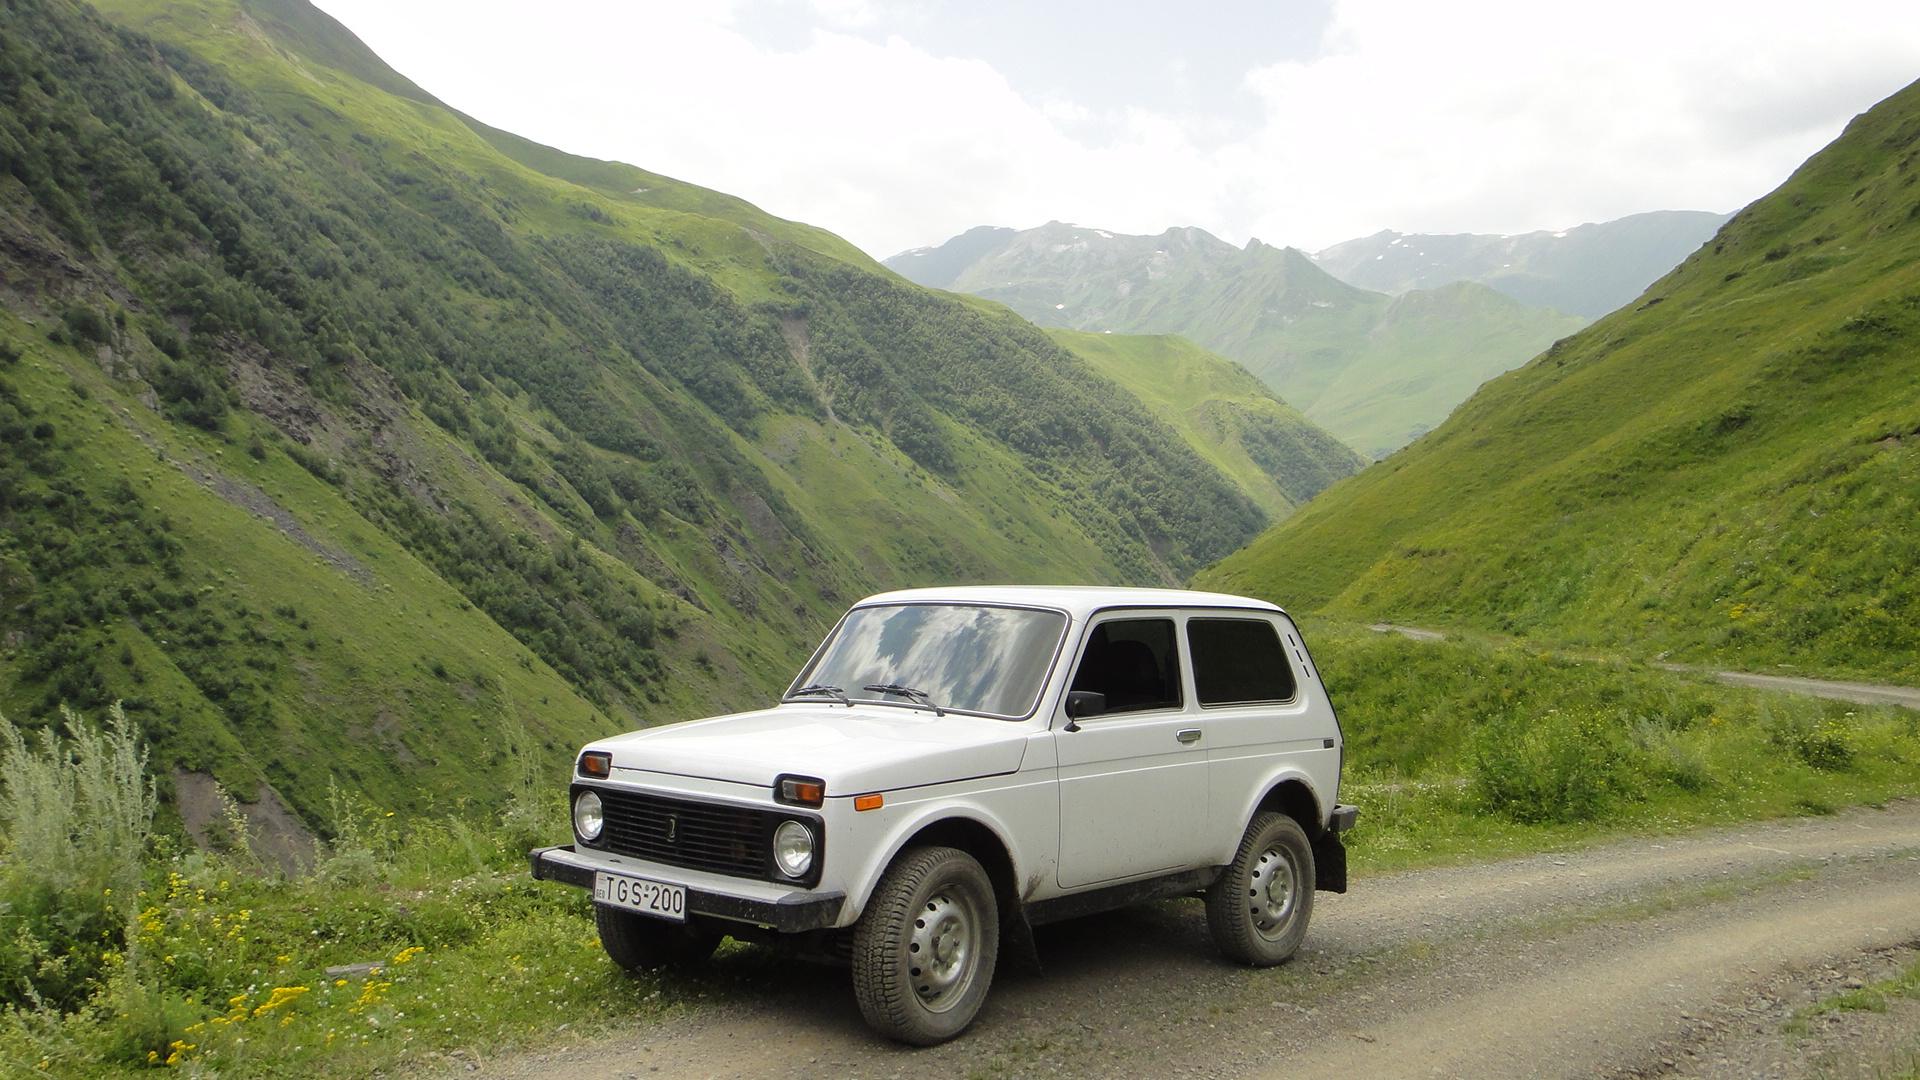 Lada Niva Best Car Ever 59461696 Added By Lasthuman